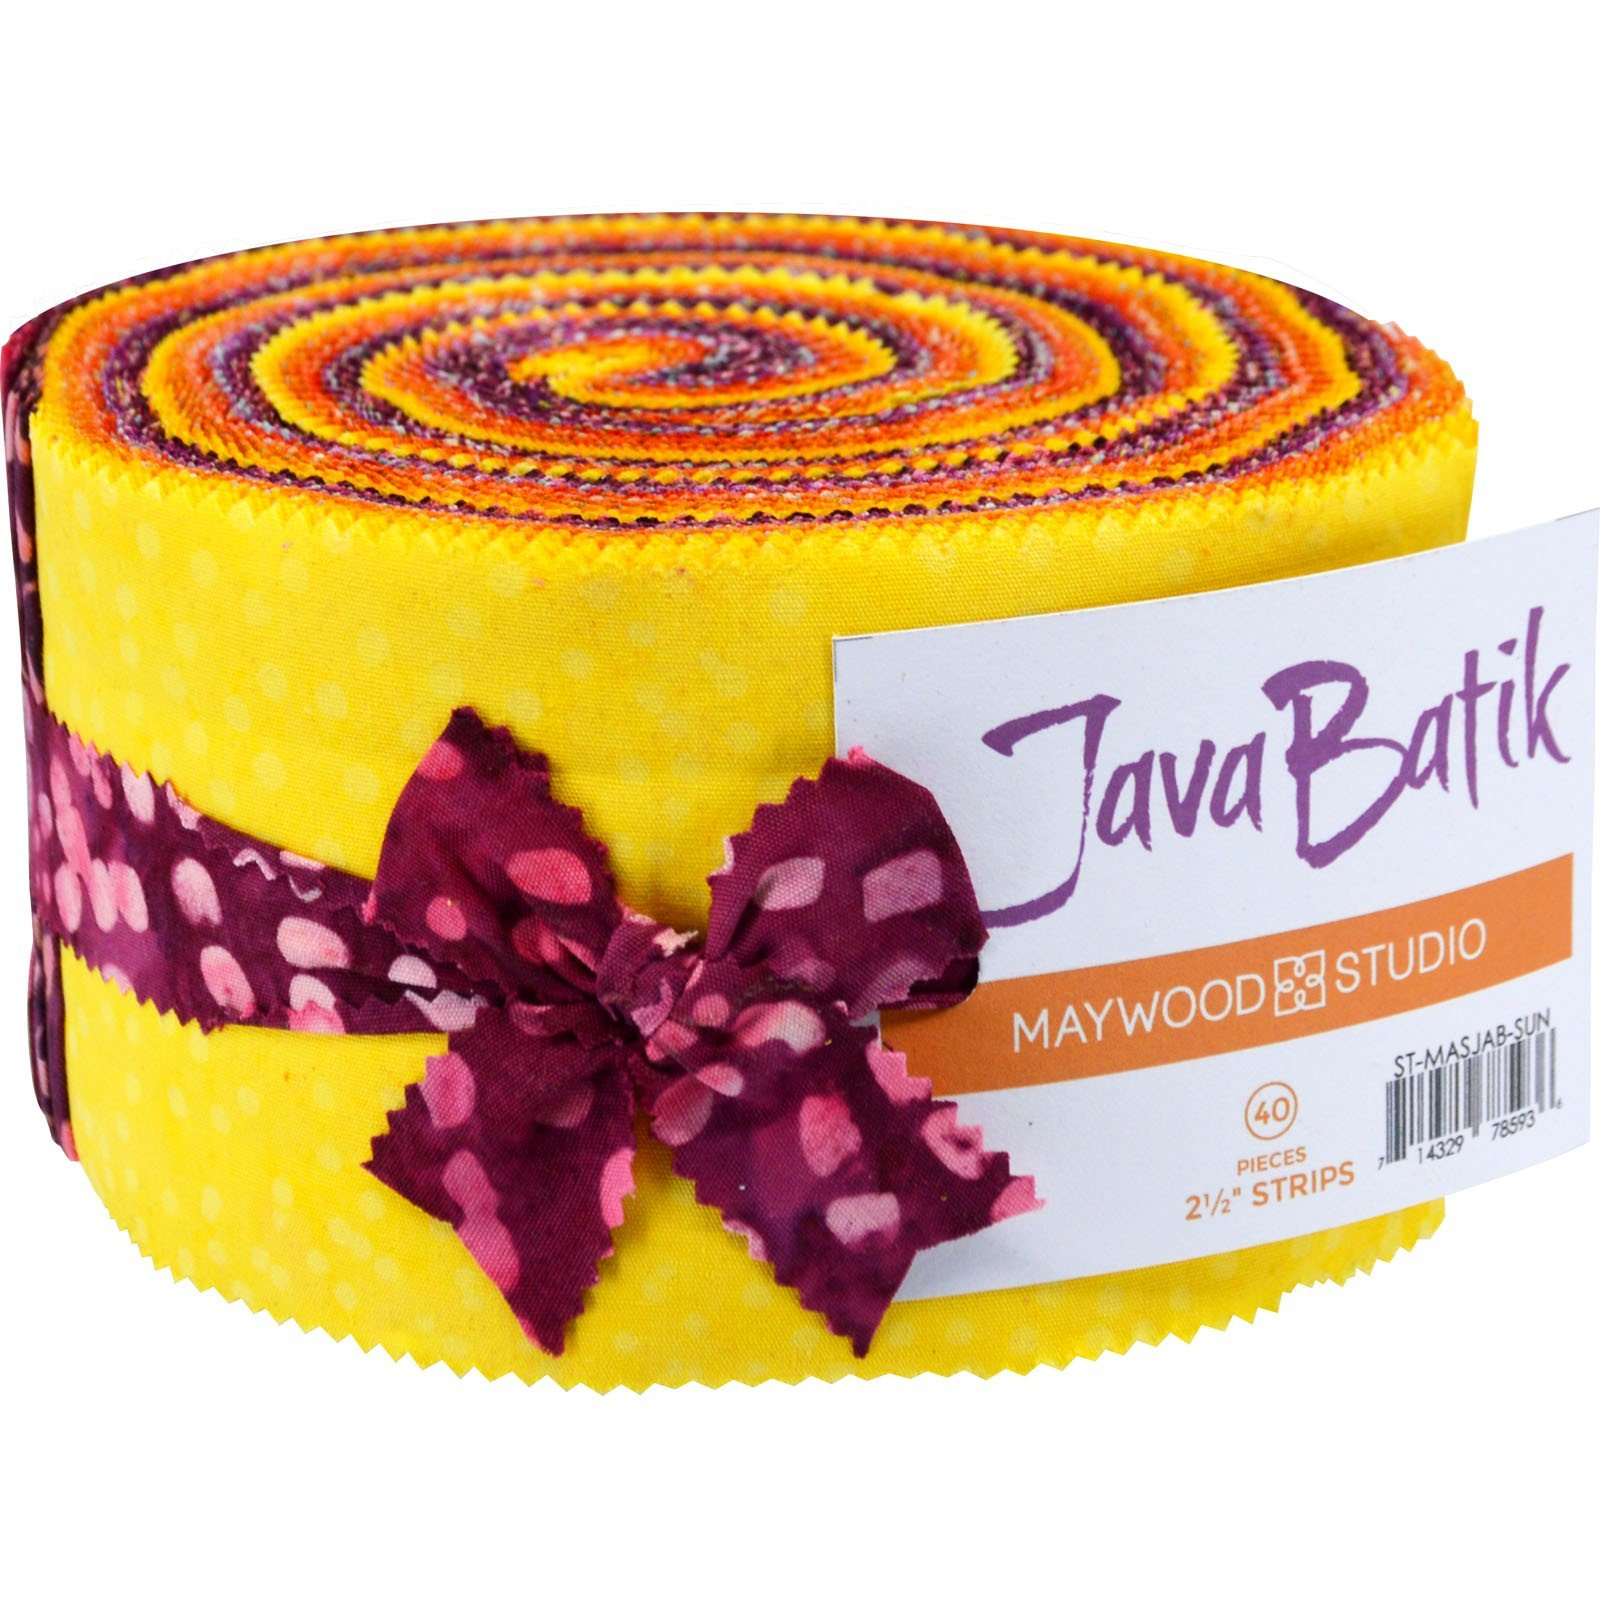 Fabric. Java Batiks SUNSET Pre-Cut strips Jelly Roll (40)